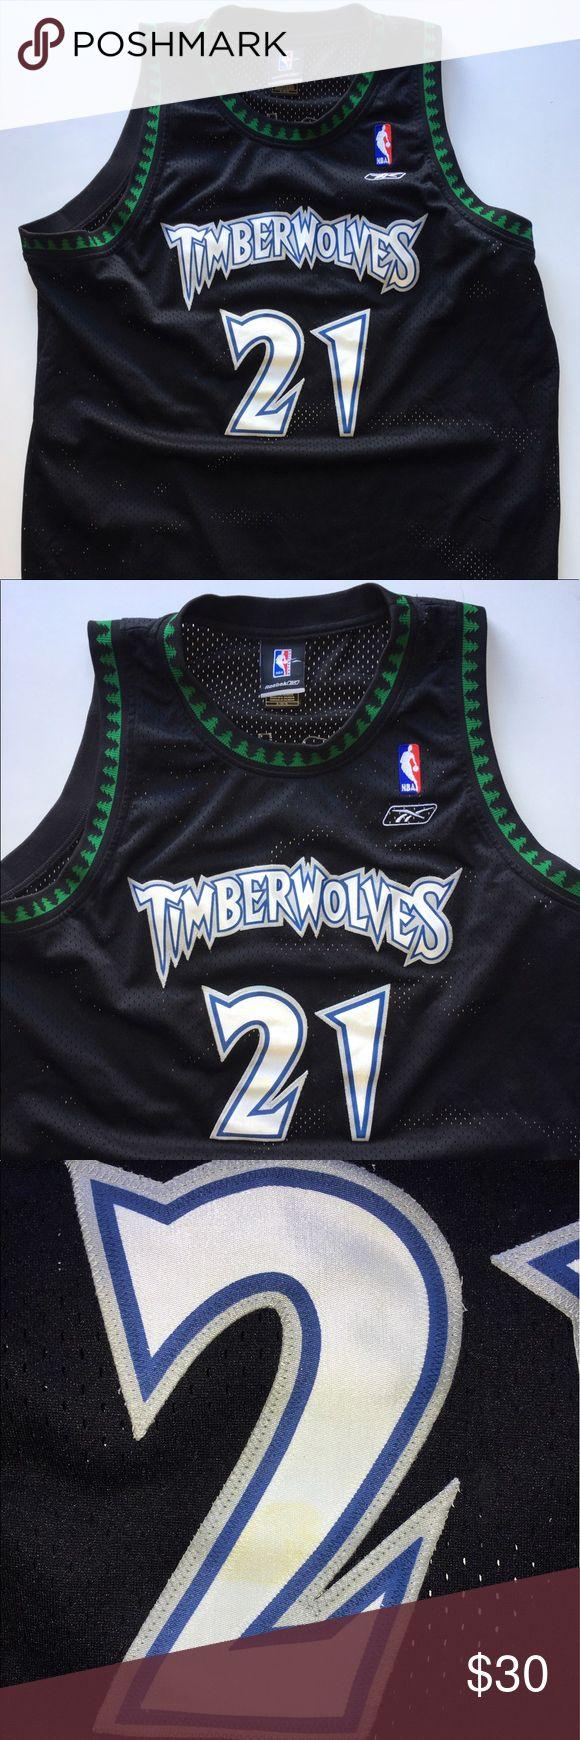 Los angeles lakers cheap nfl elite jerseys mlb coolbase jerseys nba - Vintage Reebok Kevin Garnett Jersey Size Xl